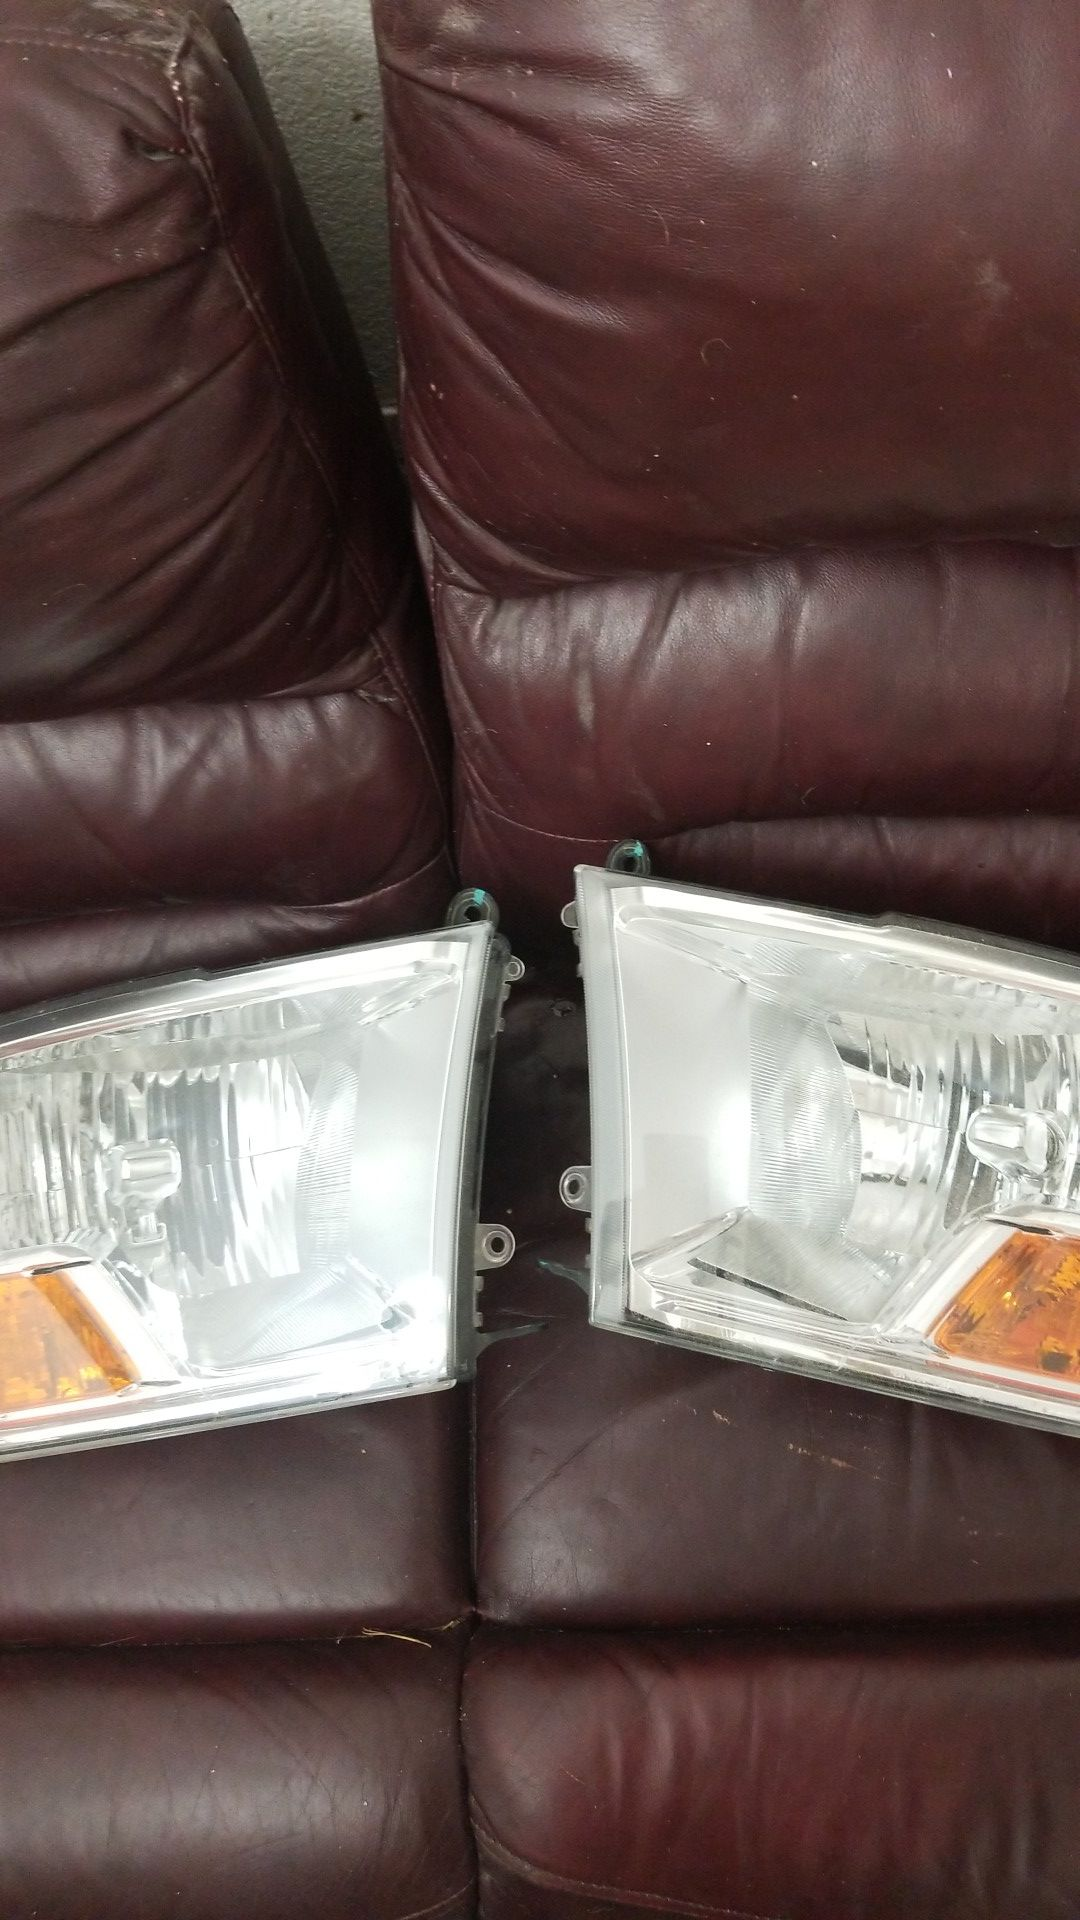 Ram truck headlights